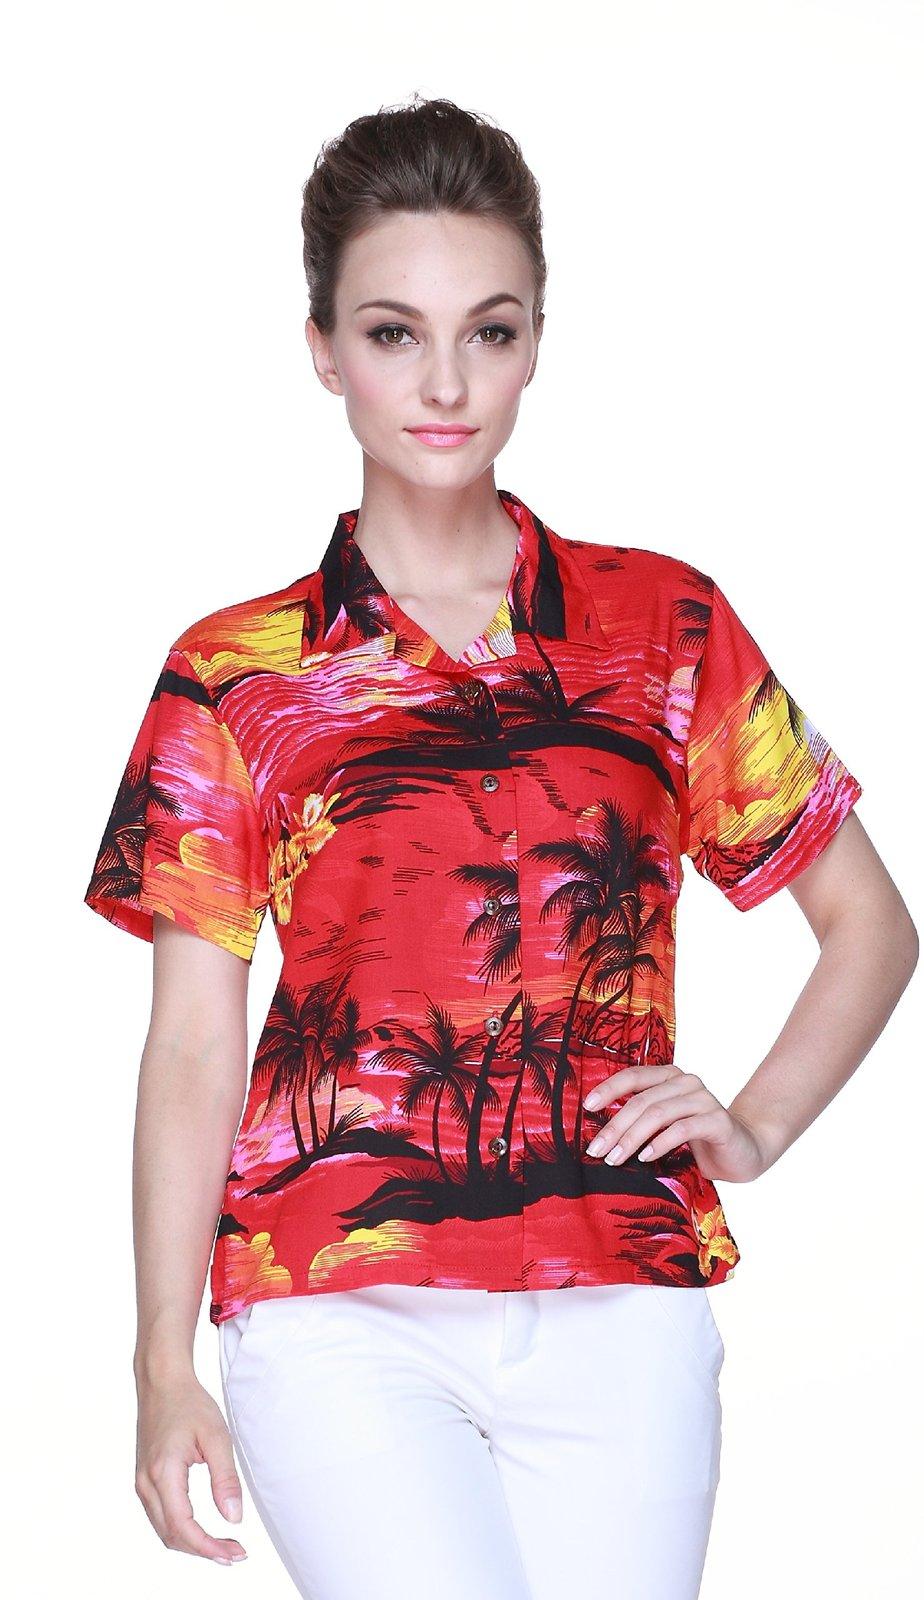 couple matching hawaiian luau outfit aloha shirts in